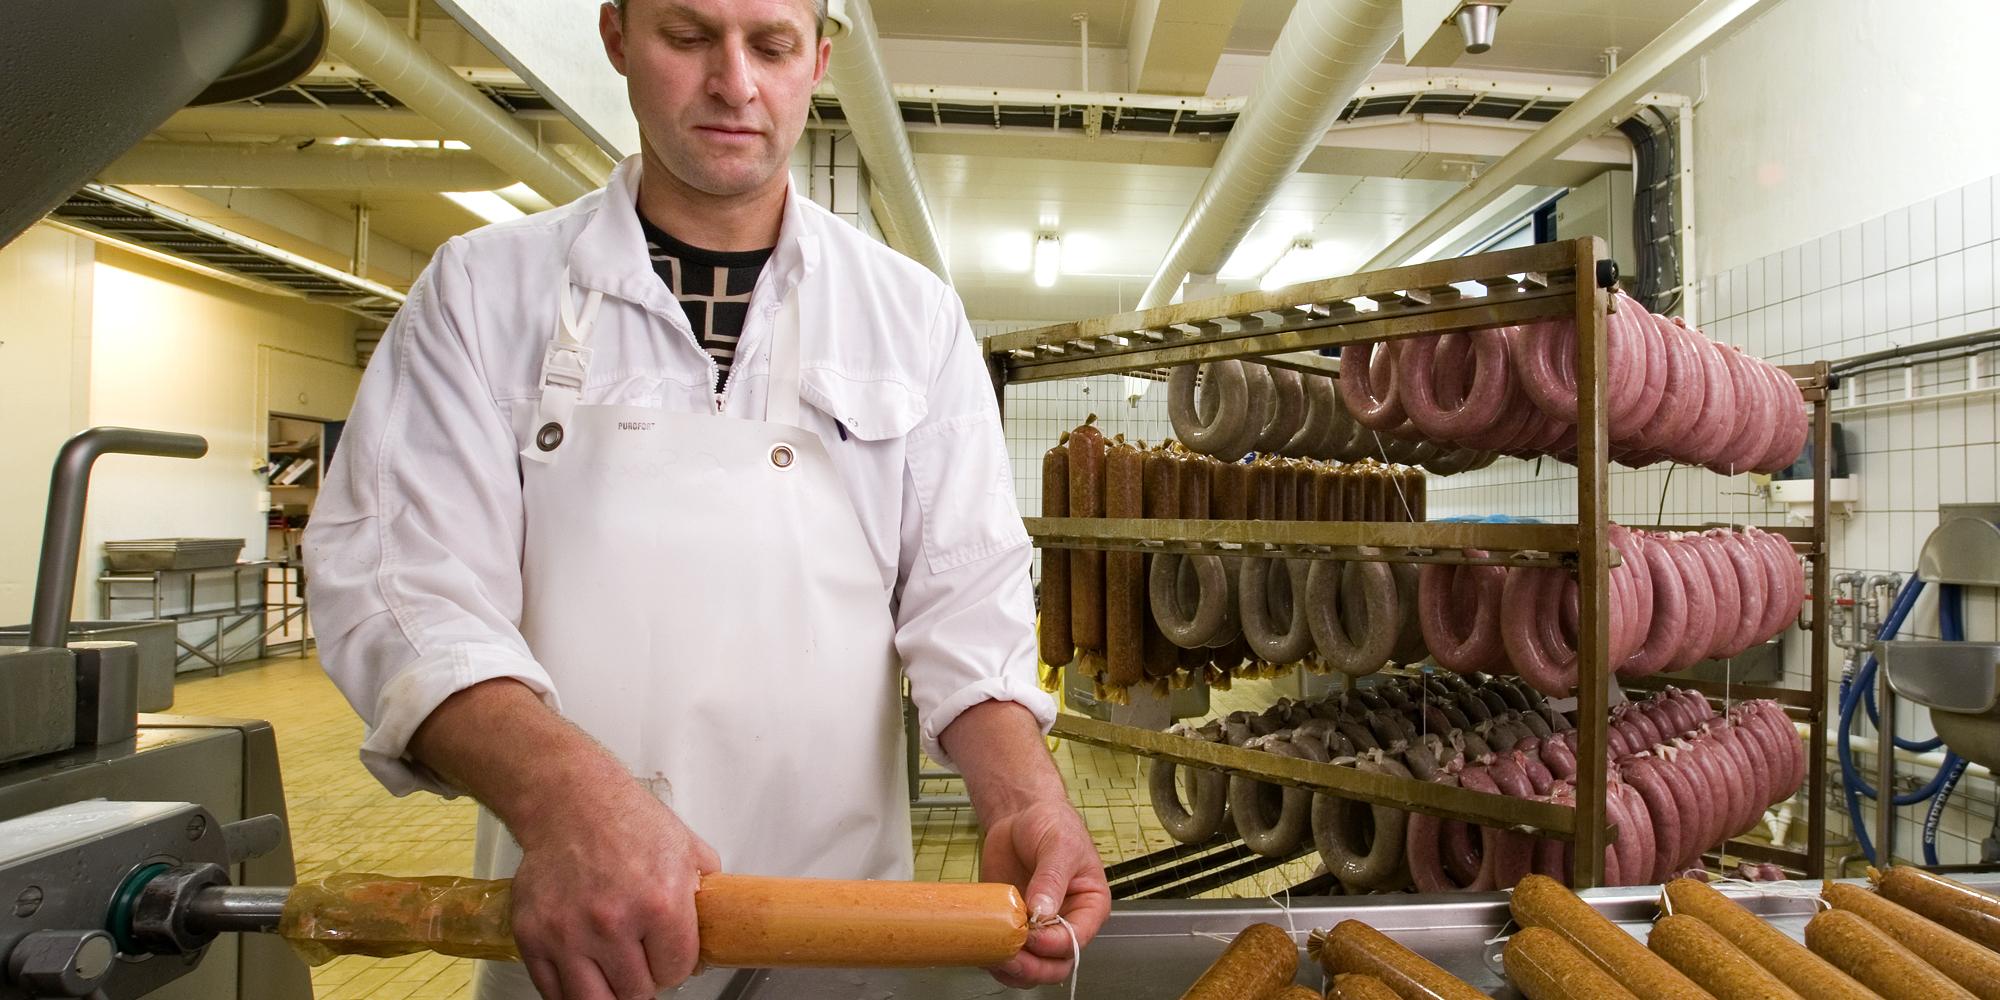 Inderøy butchery shop pølseproduksjon. Copyright: Inderøy Slakteri